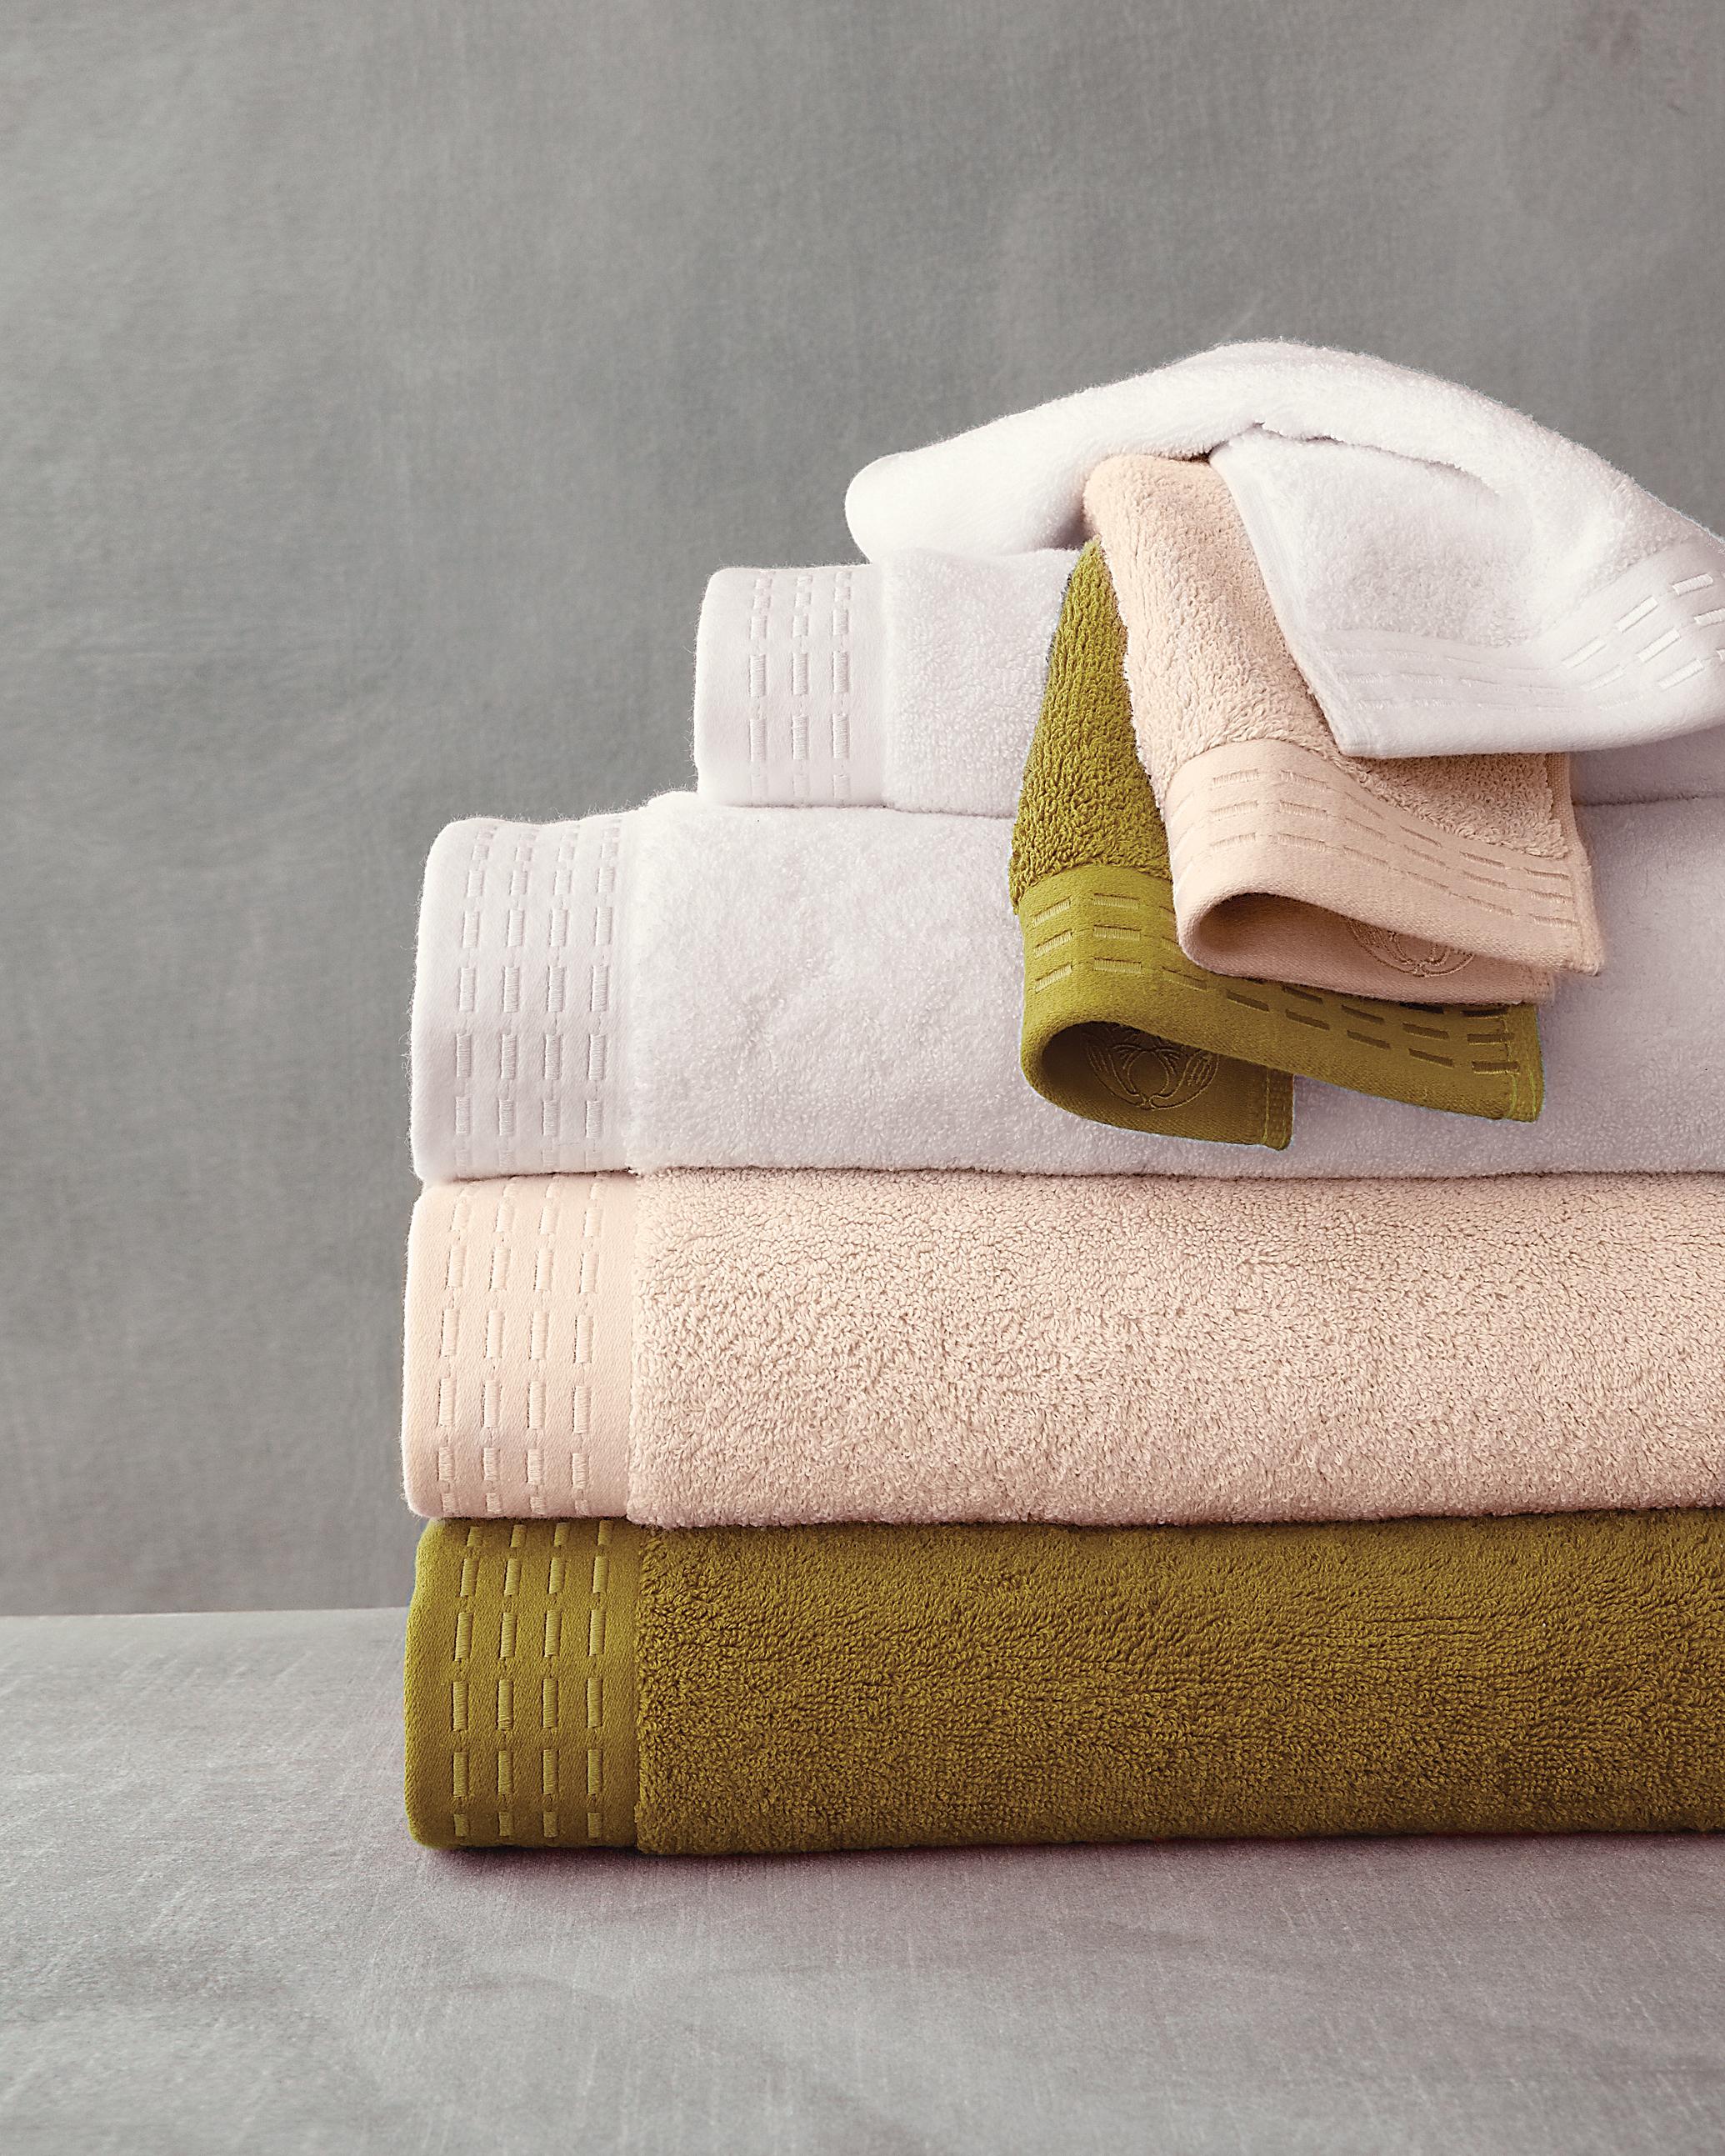 towels-0811mwd107434.jpg